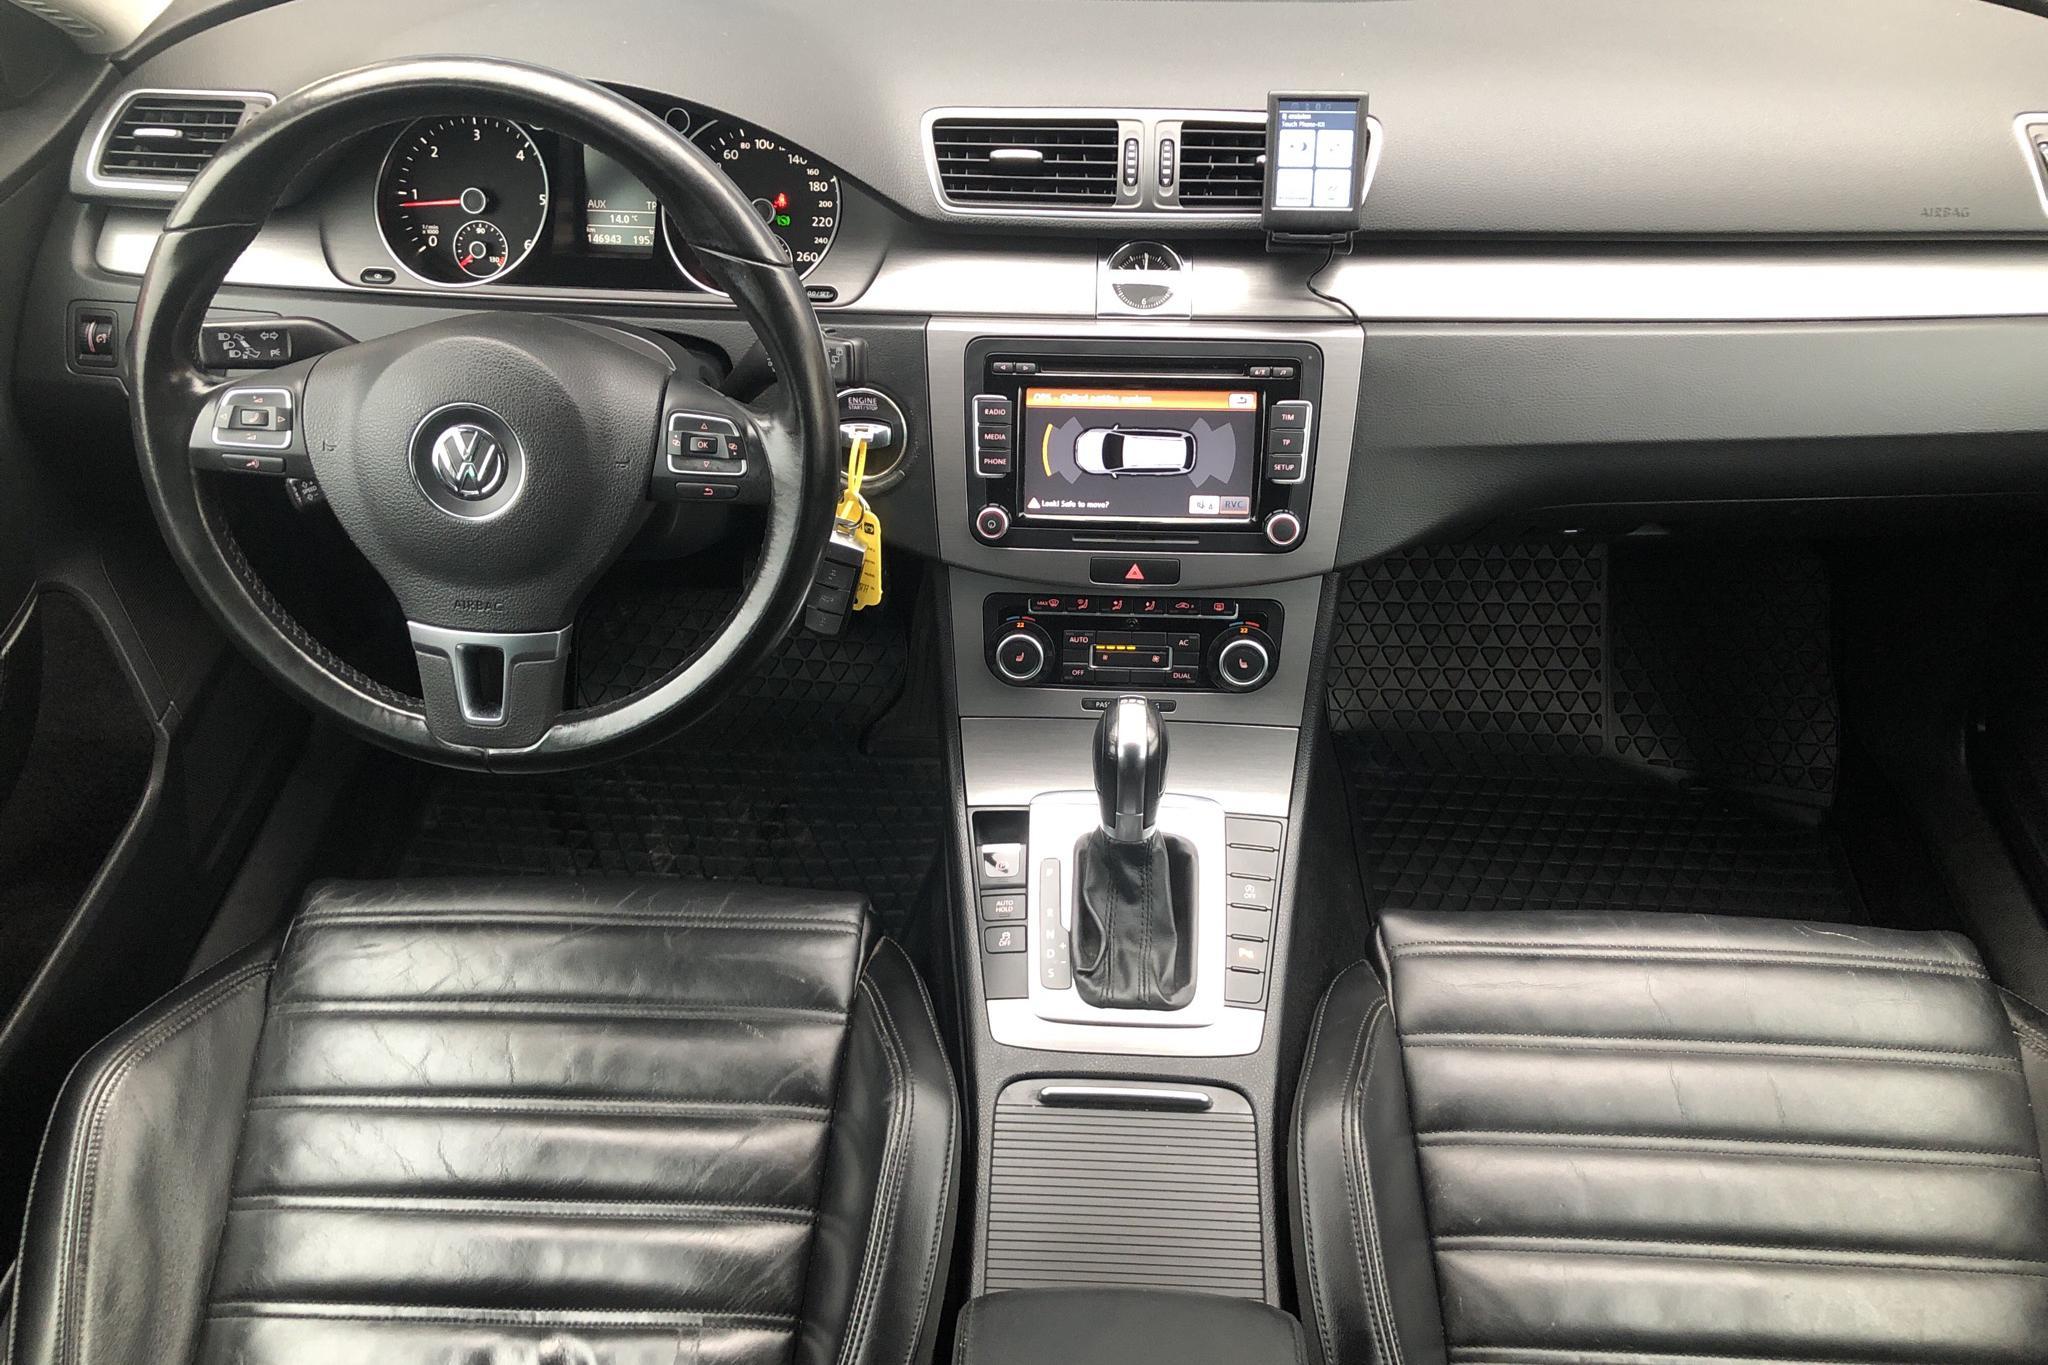 VW Passat 2.0 TDI BlueMotion Technology Variant (170hk) - 146 950 km - Automatic - white - 2012